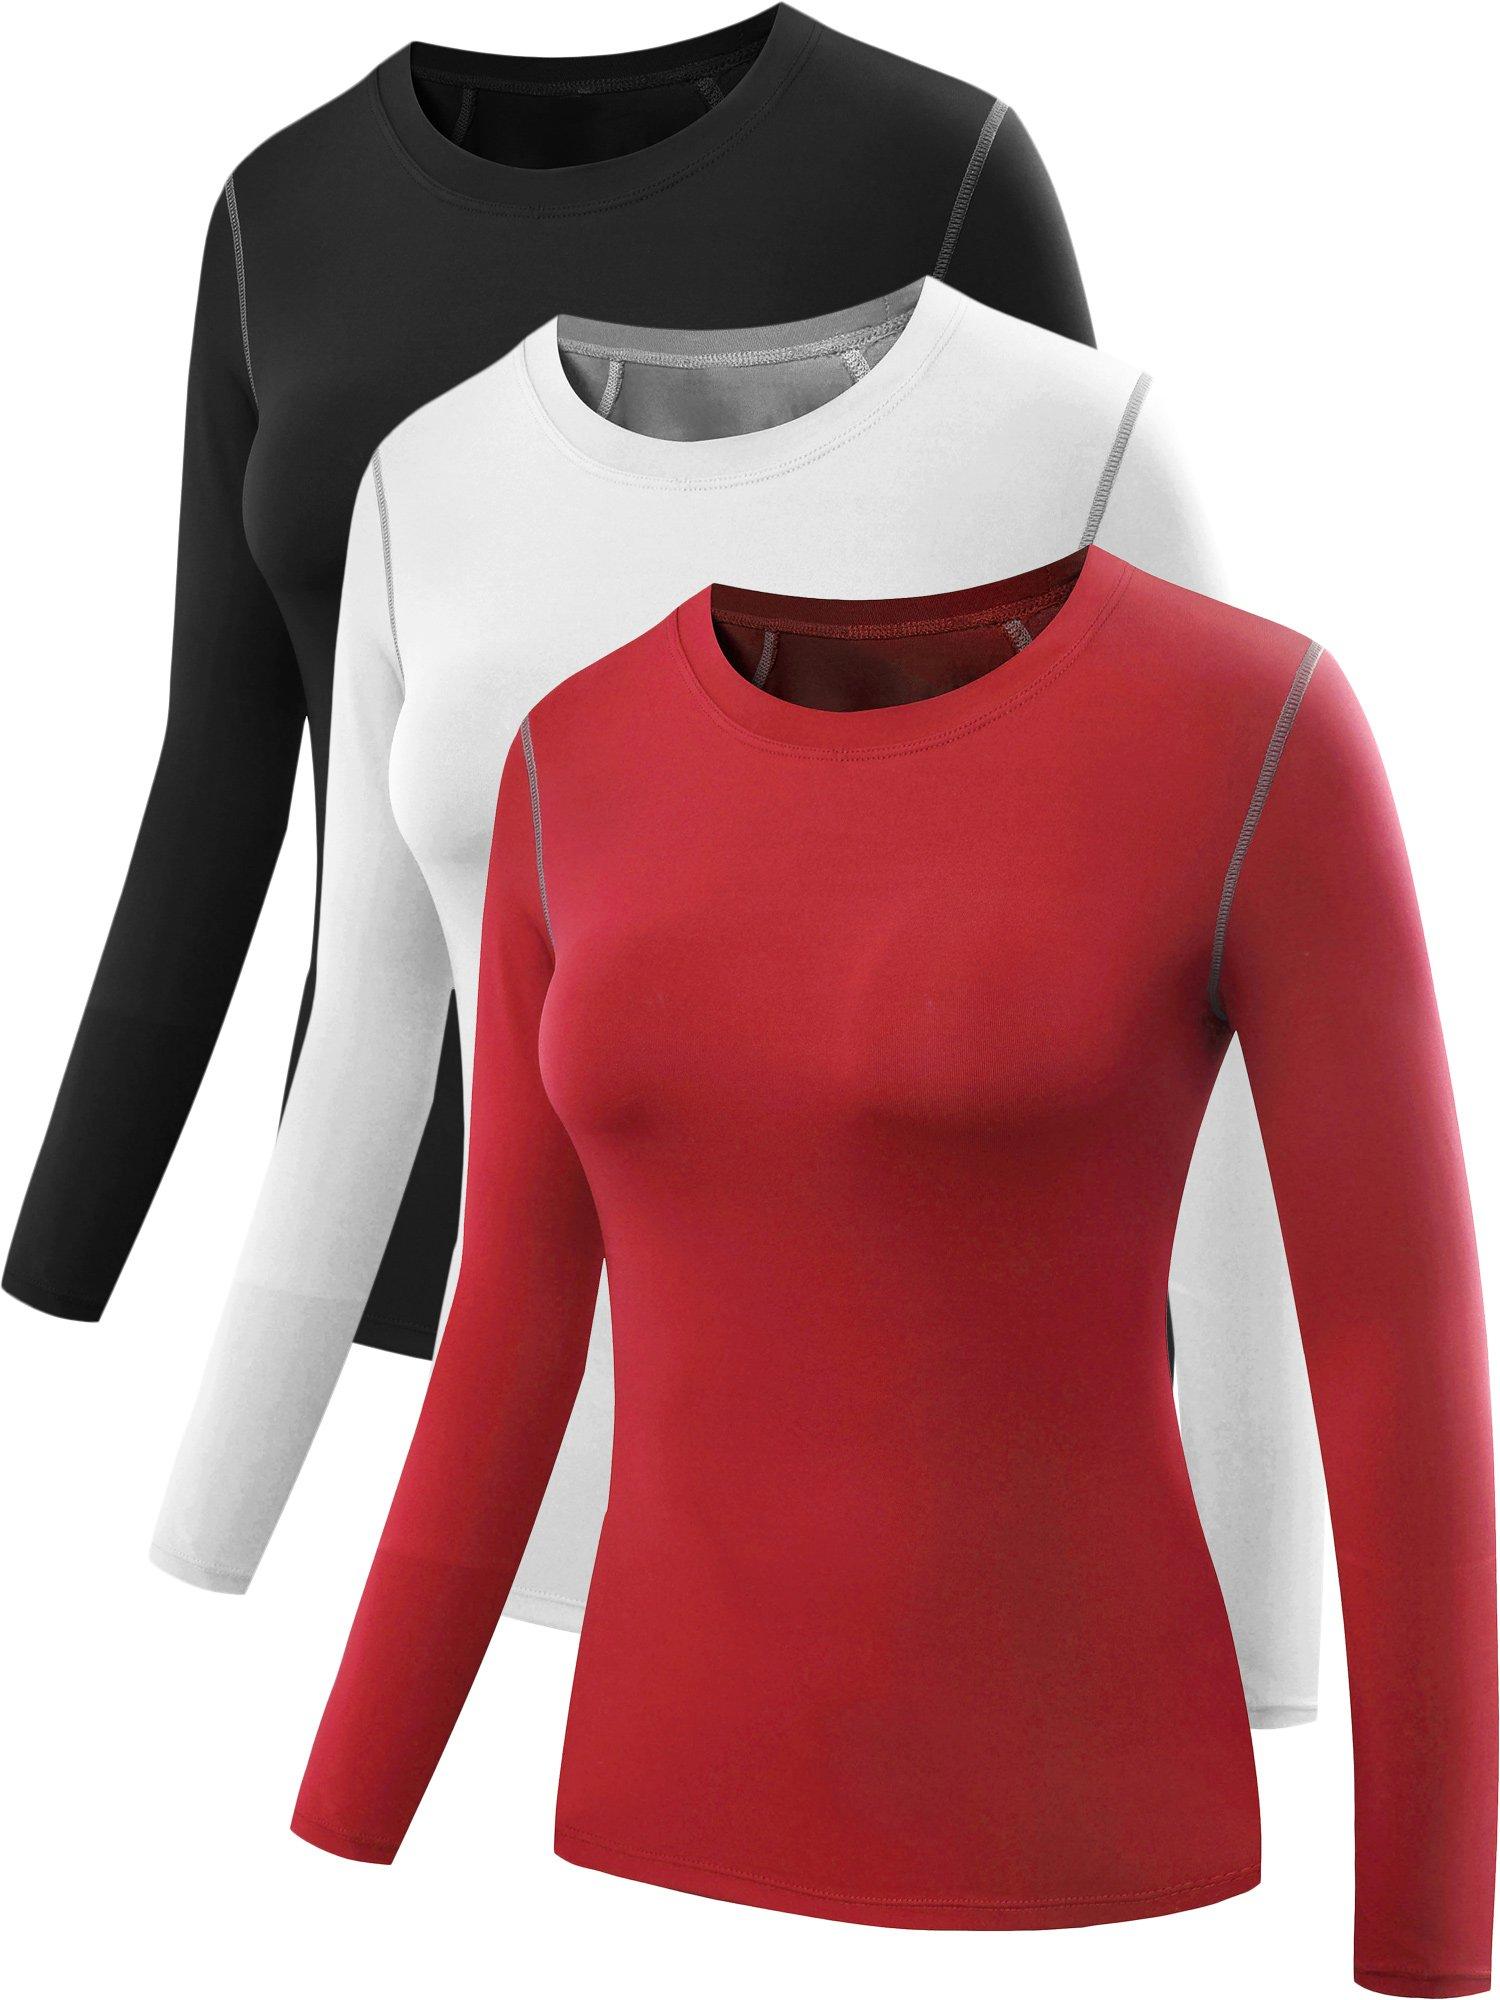 Neleus Women's 3 Pack Dry Fit Athletic Compression Long Sleeve T Shirt,Black,Red,White,2XL,EU 3XL by Neleus